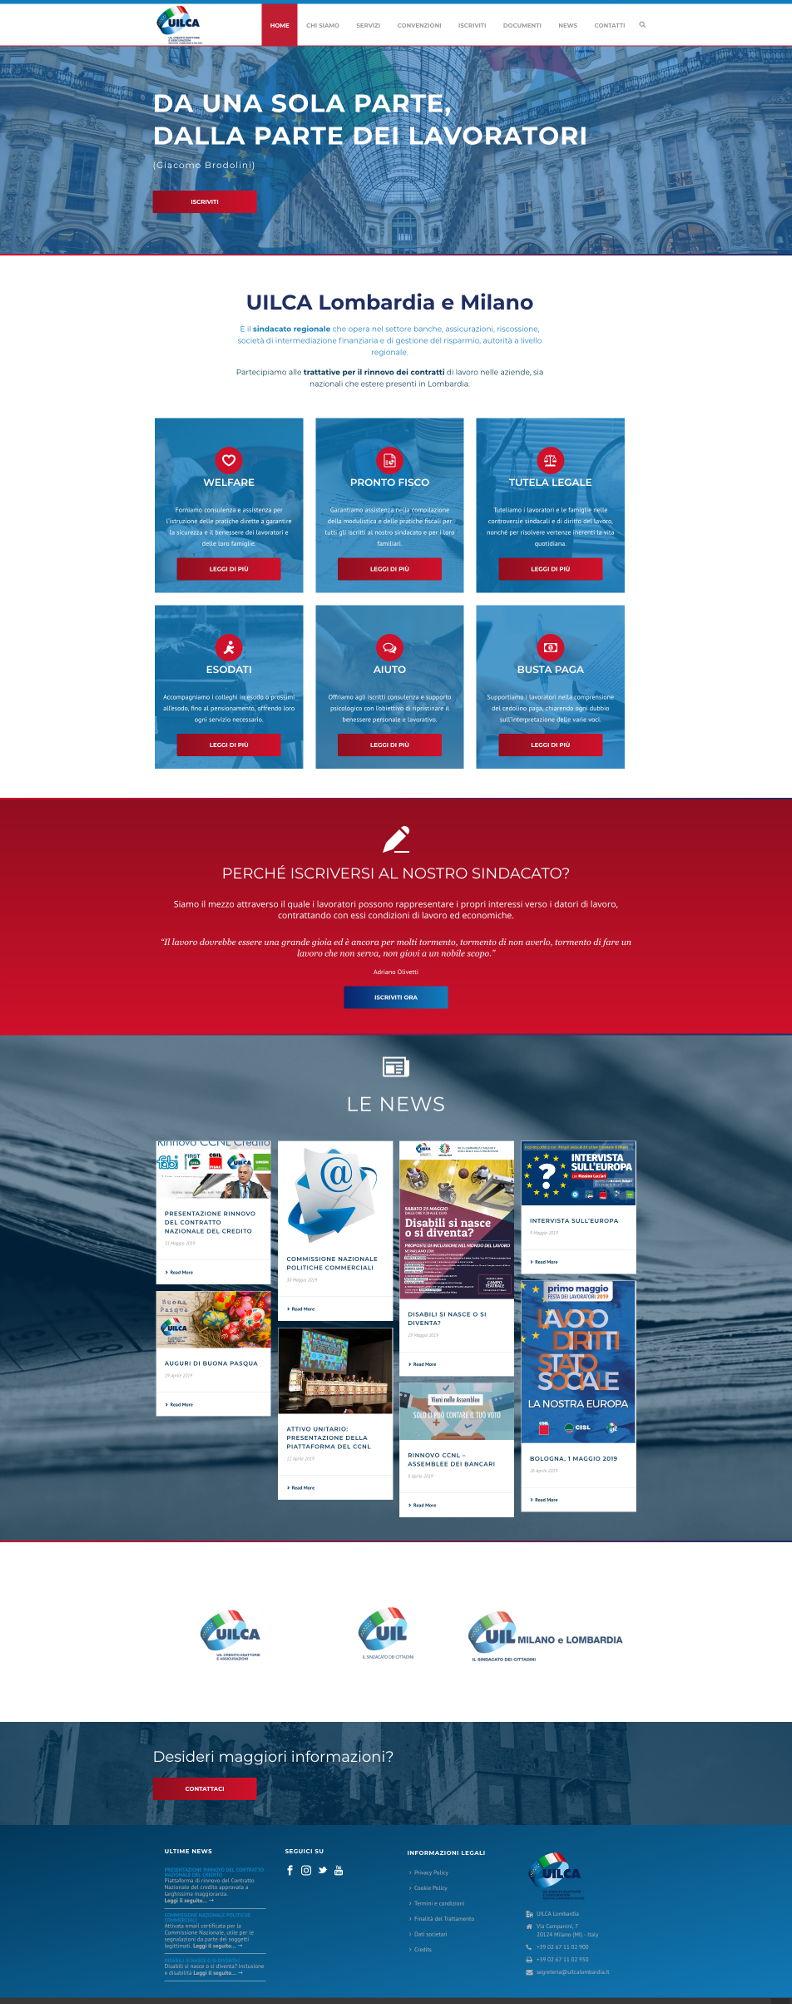 Website design uilca lombardia e milano paola cinti for Web designer milano